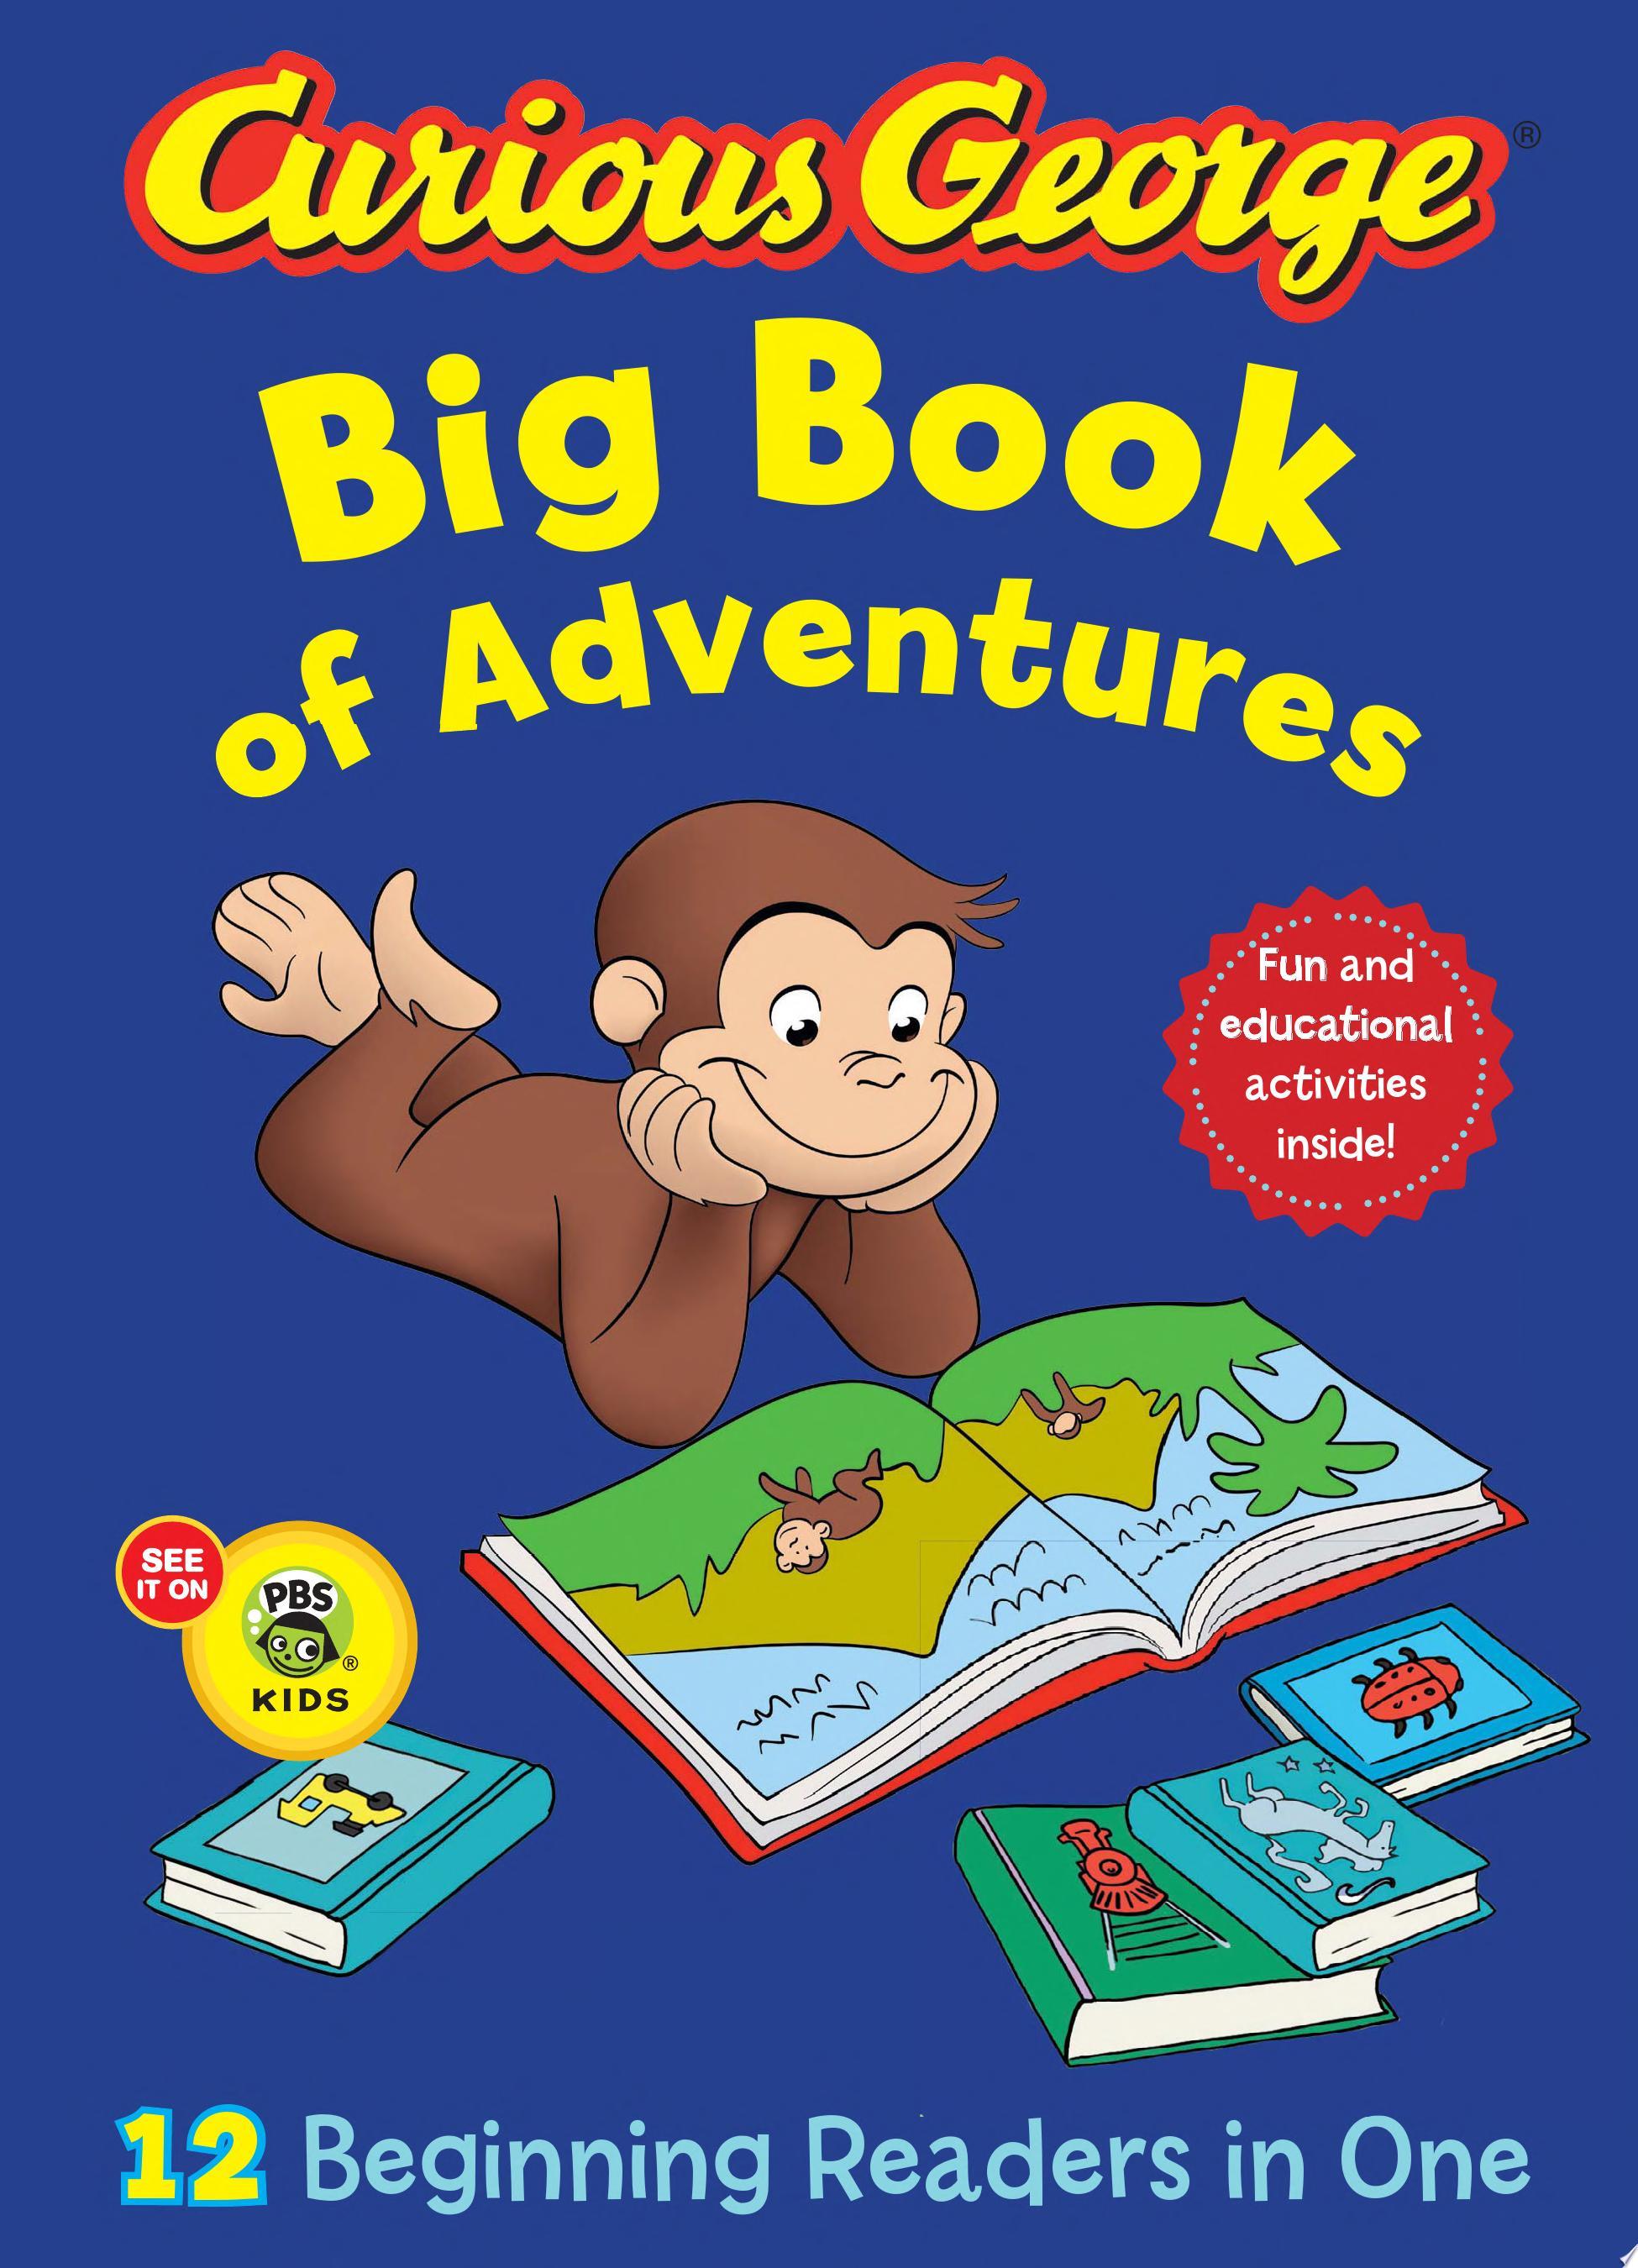 Curious George Big Book of Adventures